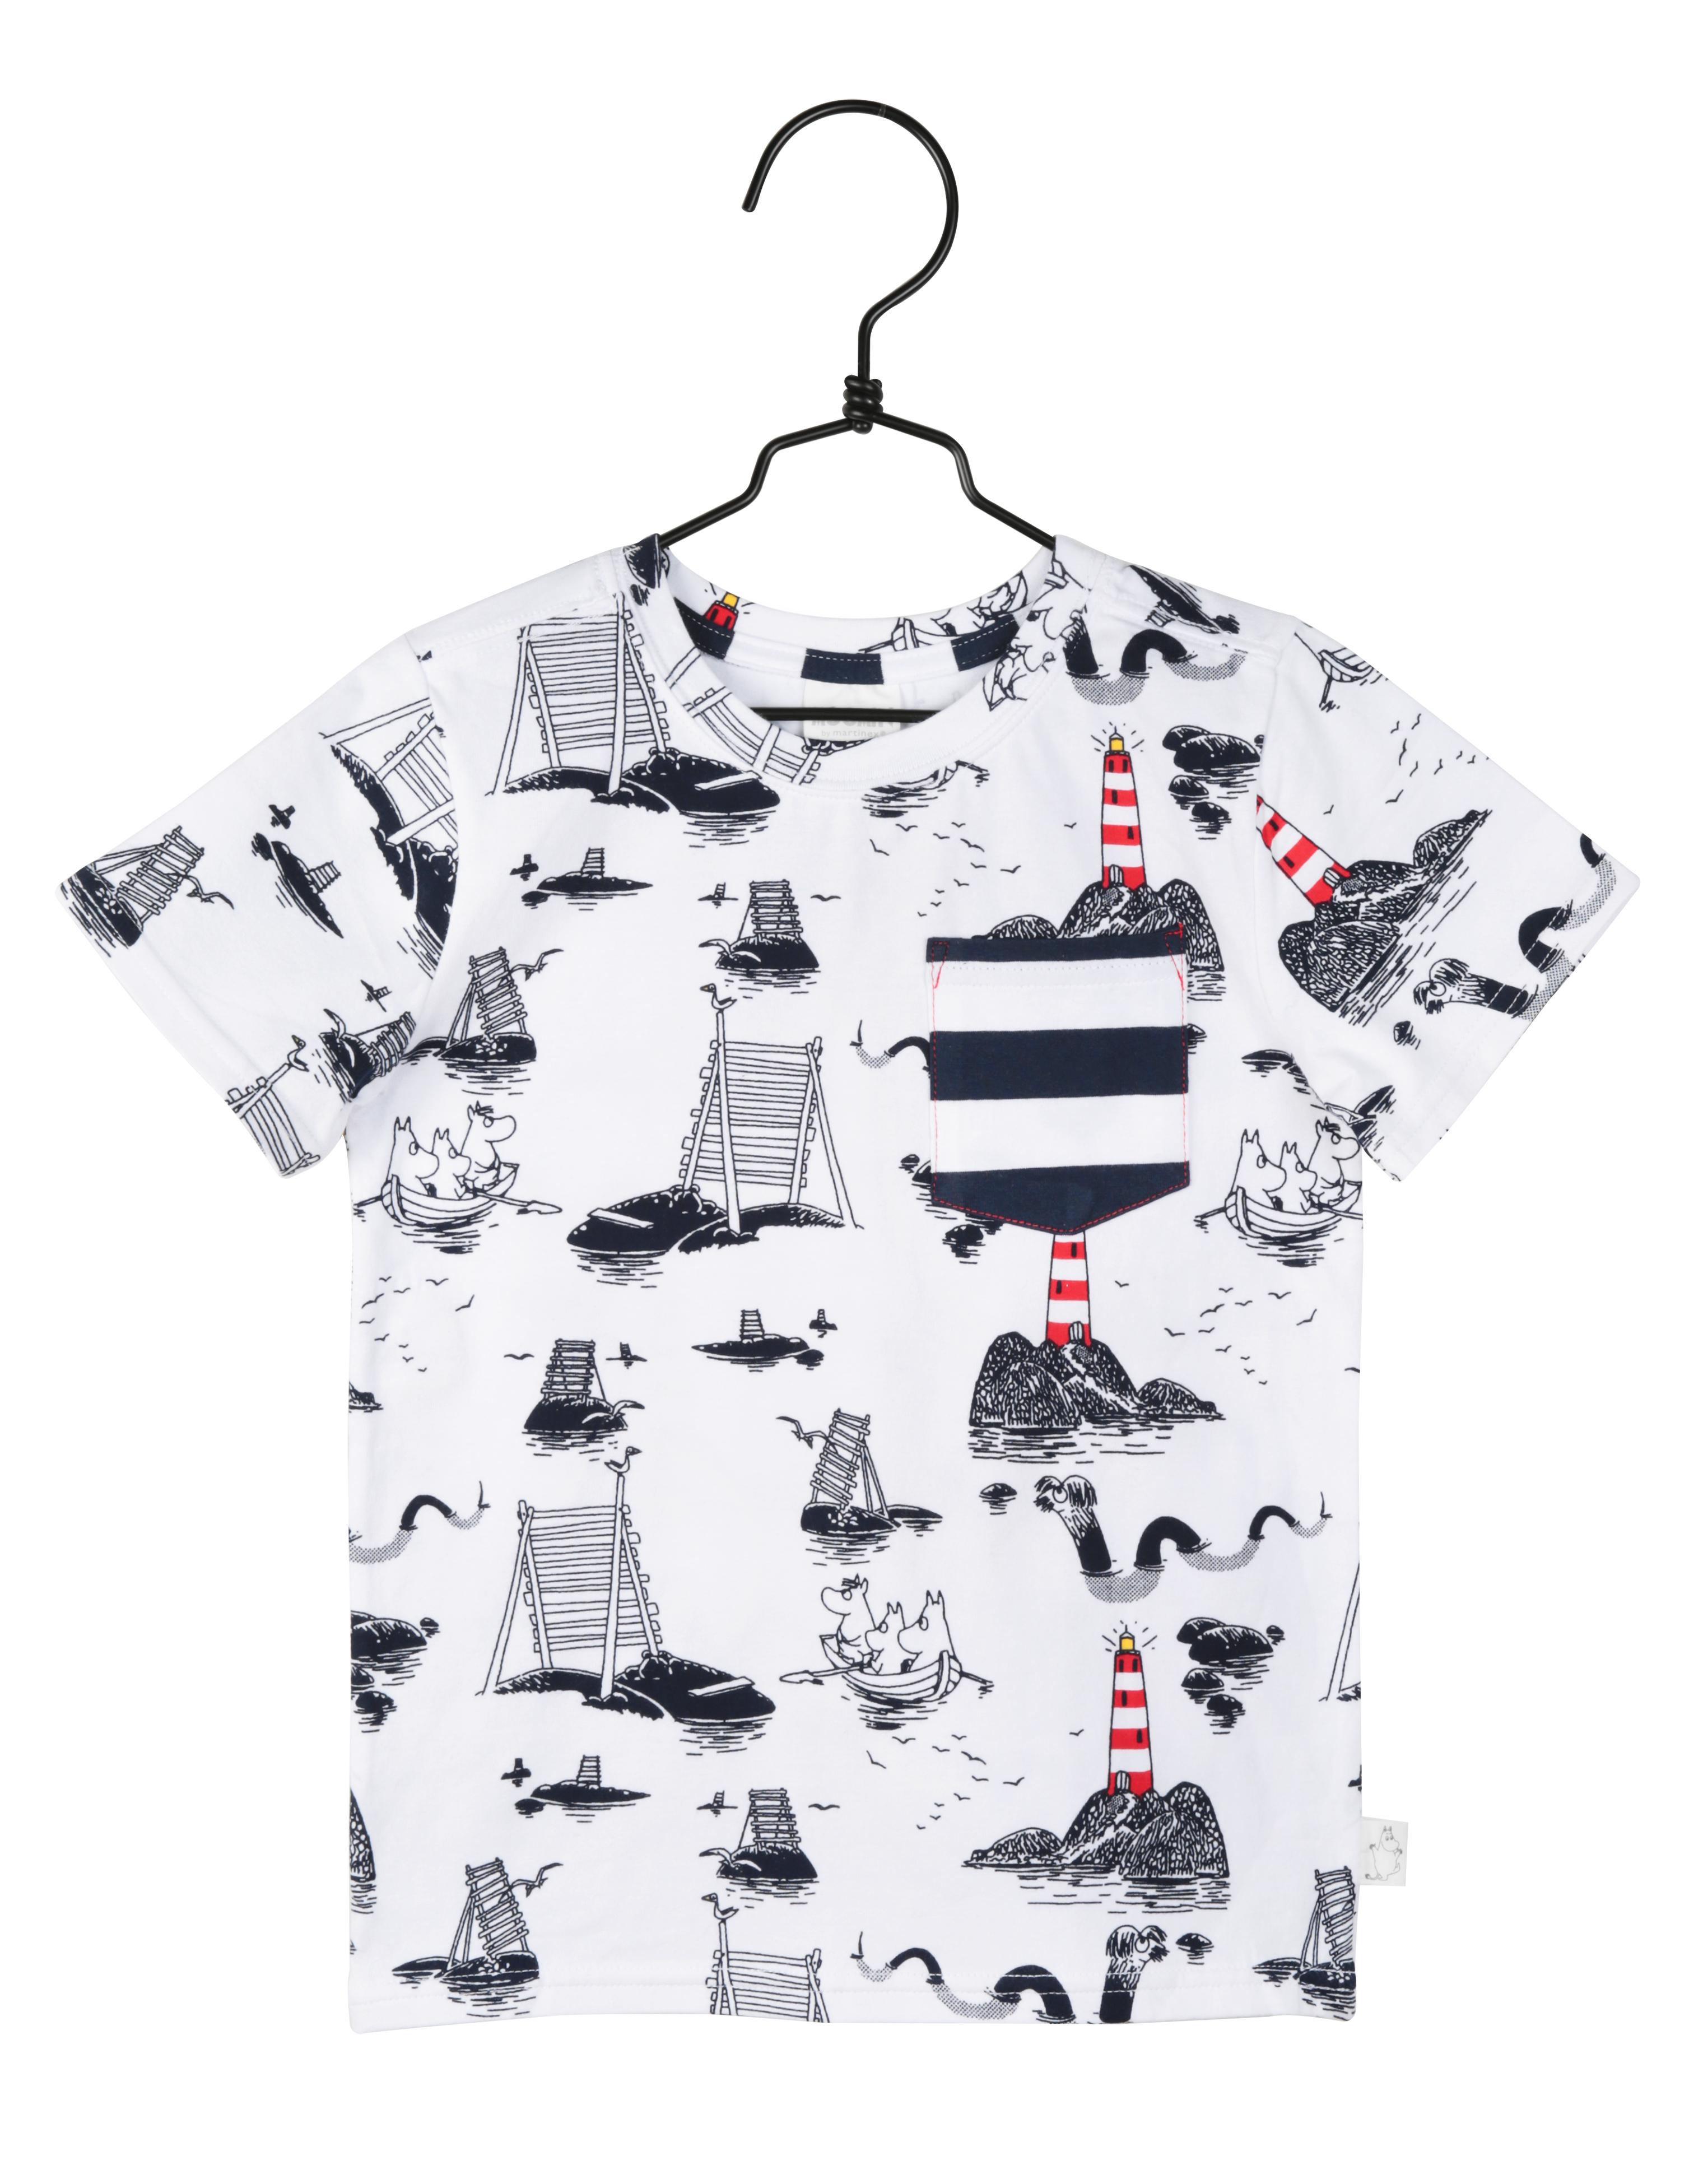 Martinex Moomin Sea T-Shirt